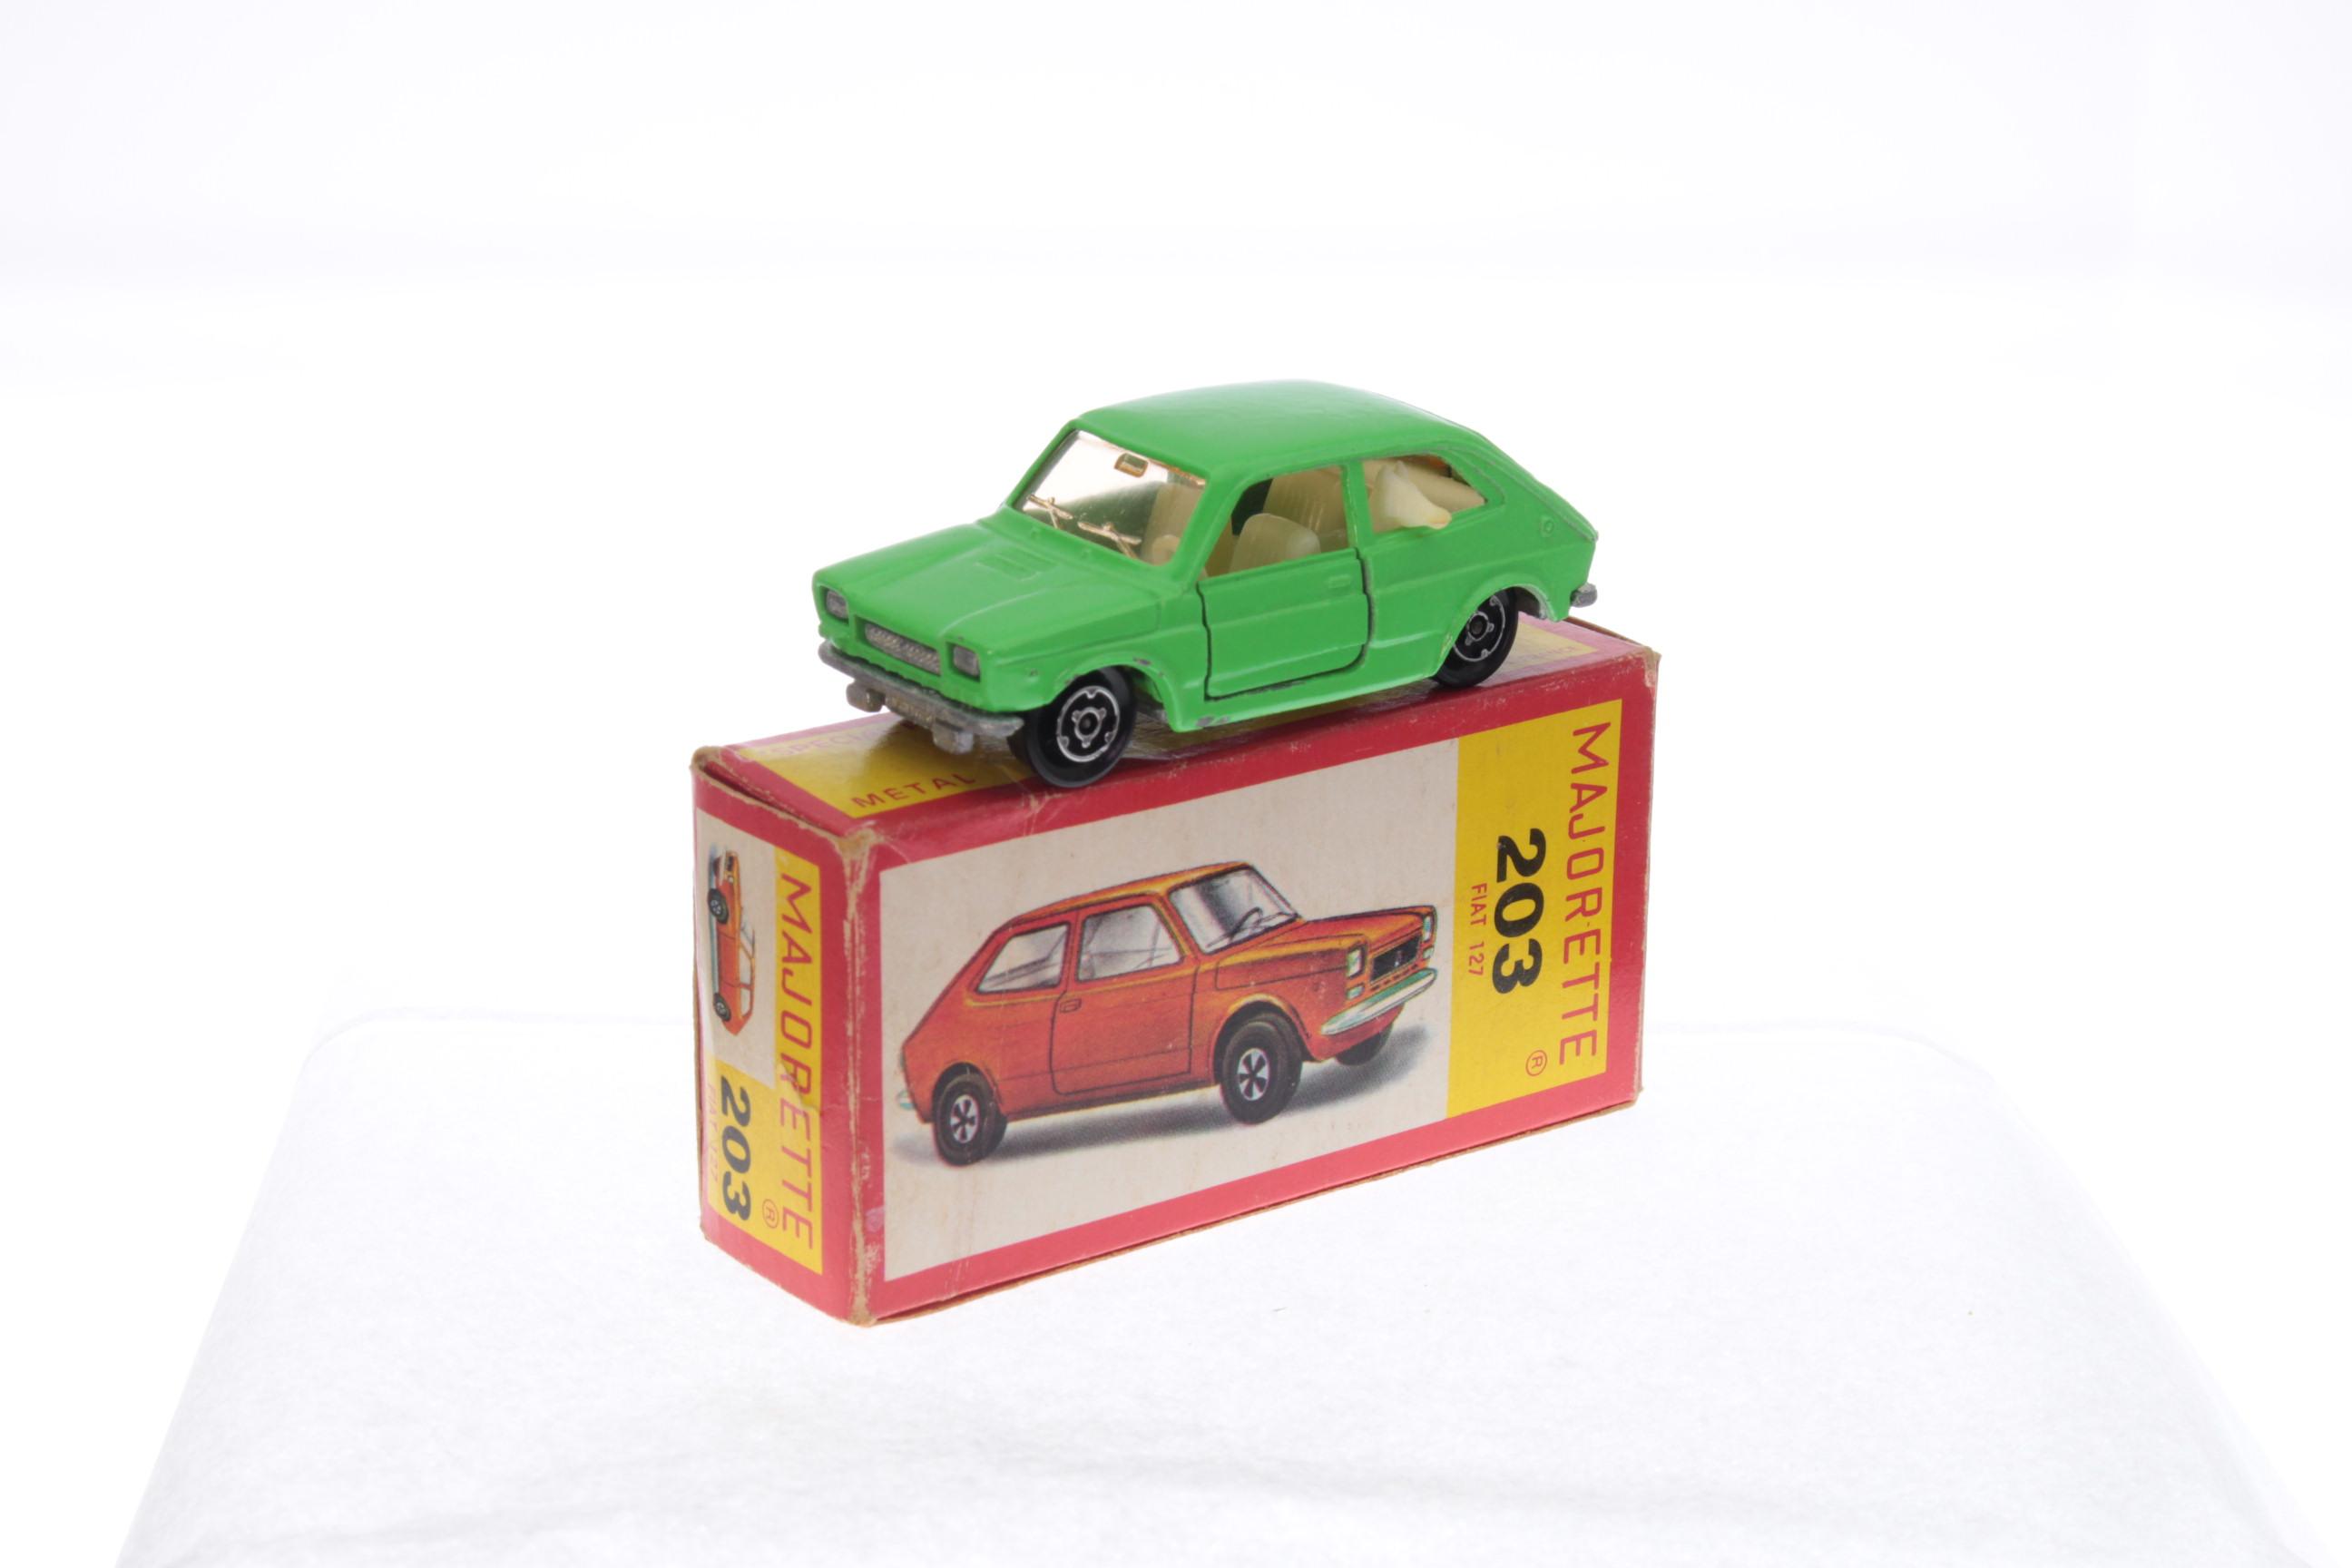 Picture Gallery for Majorette 203 Fiat 127